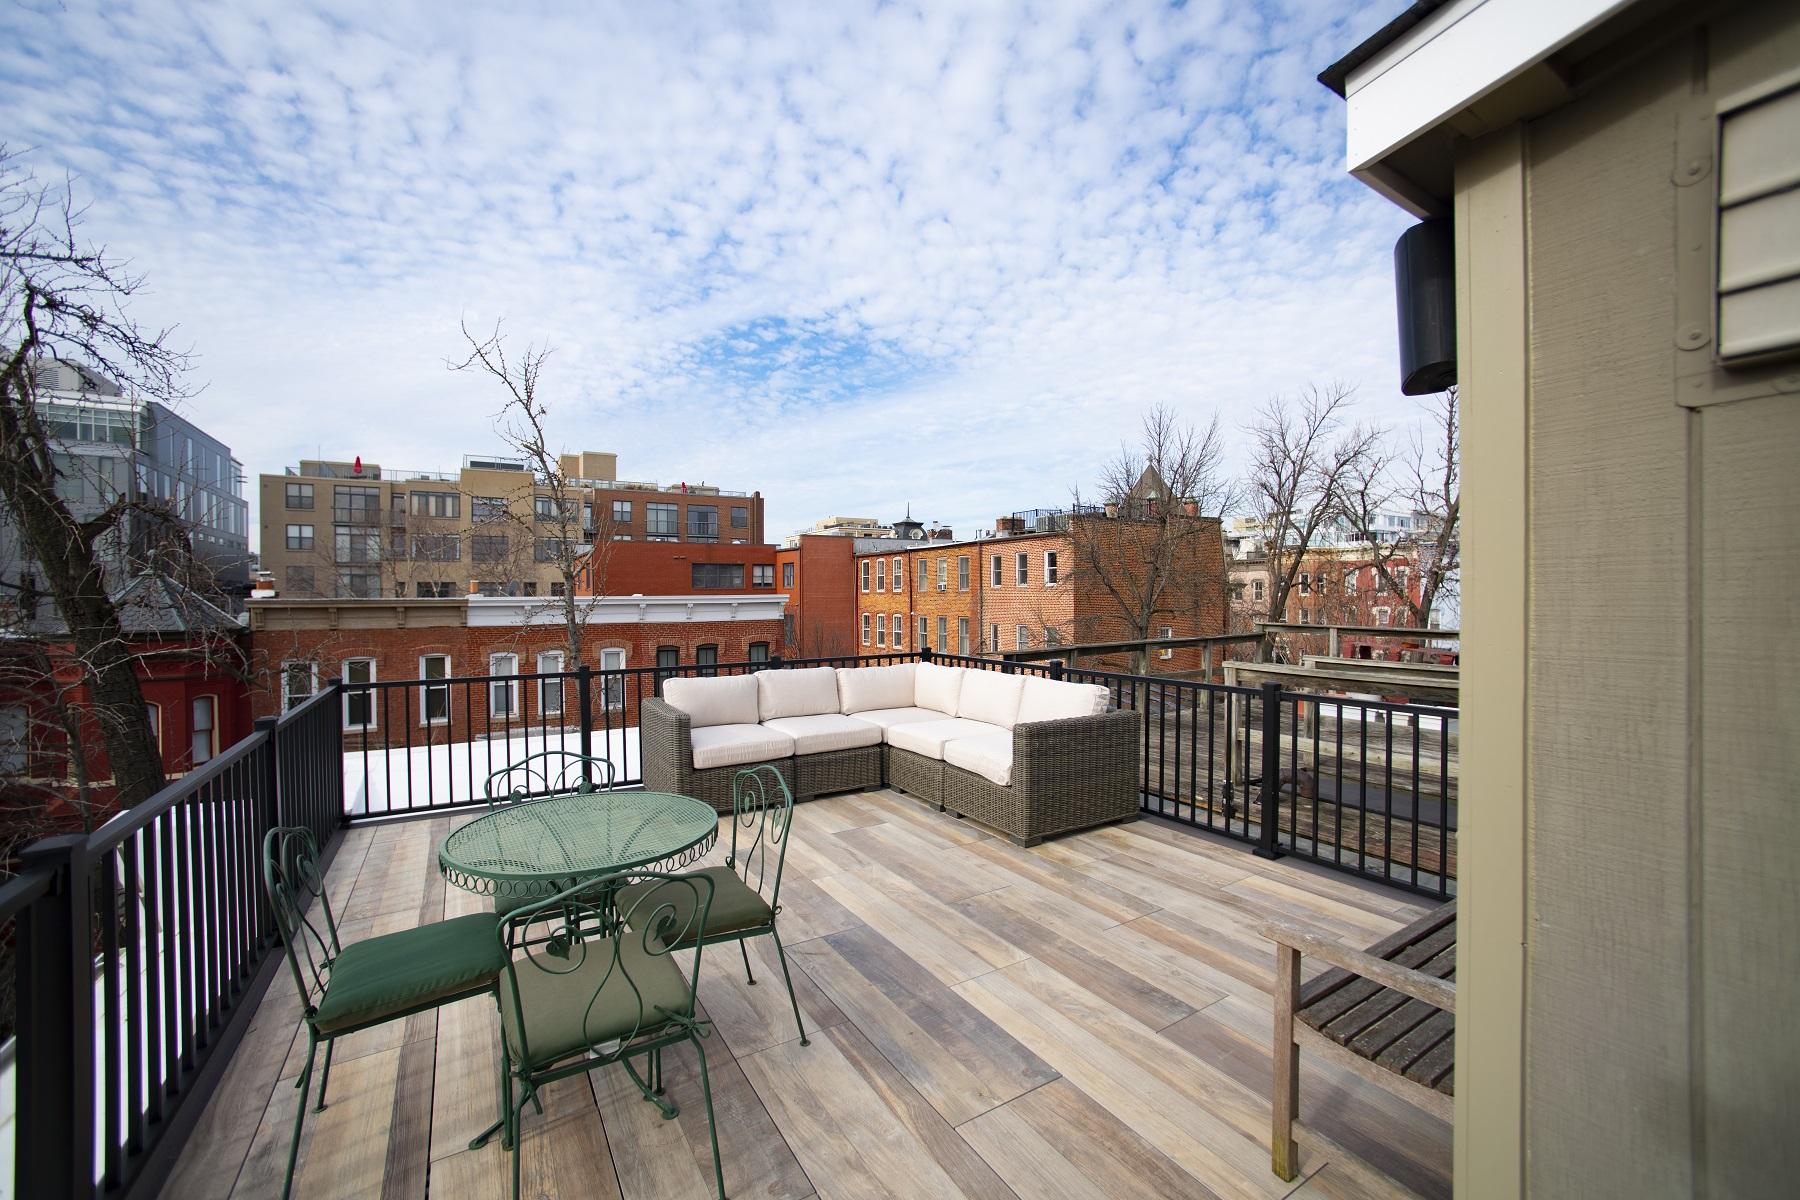 Low Maintenance Rooftop Deck Design With Archatrak Tiles